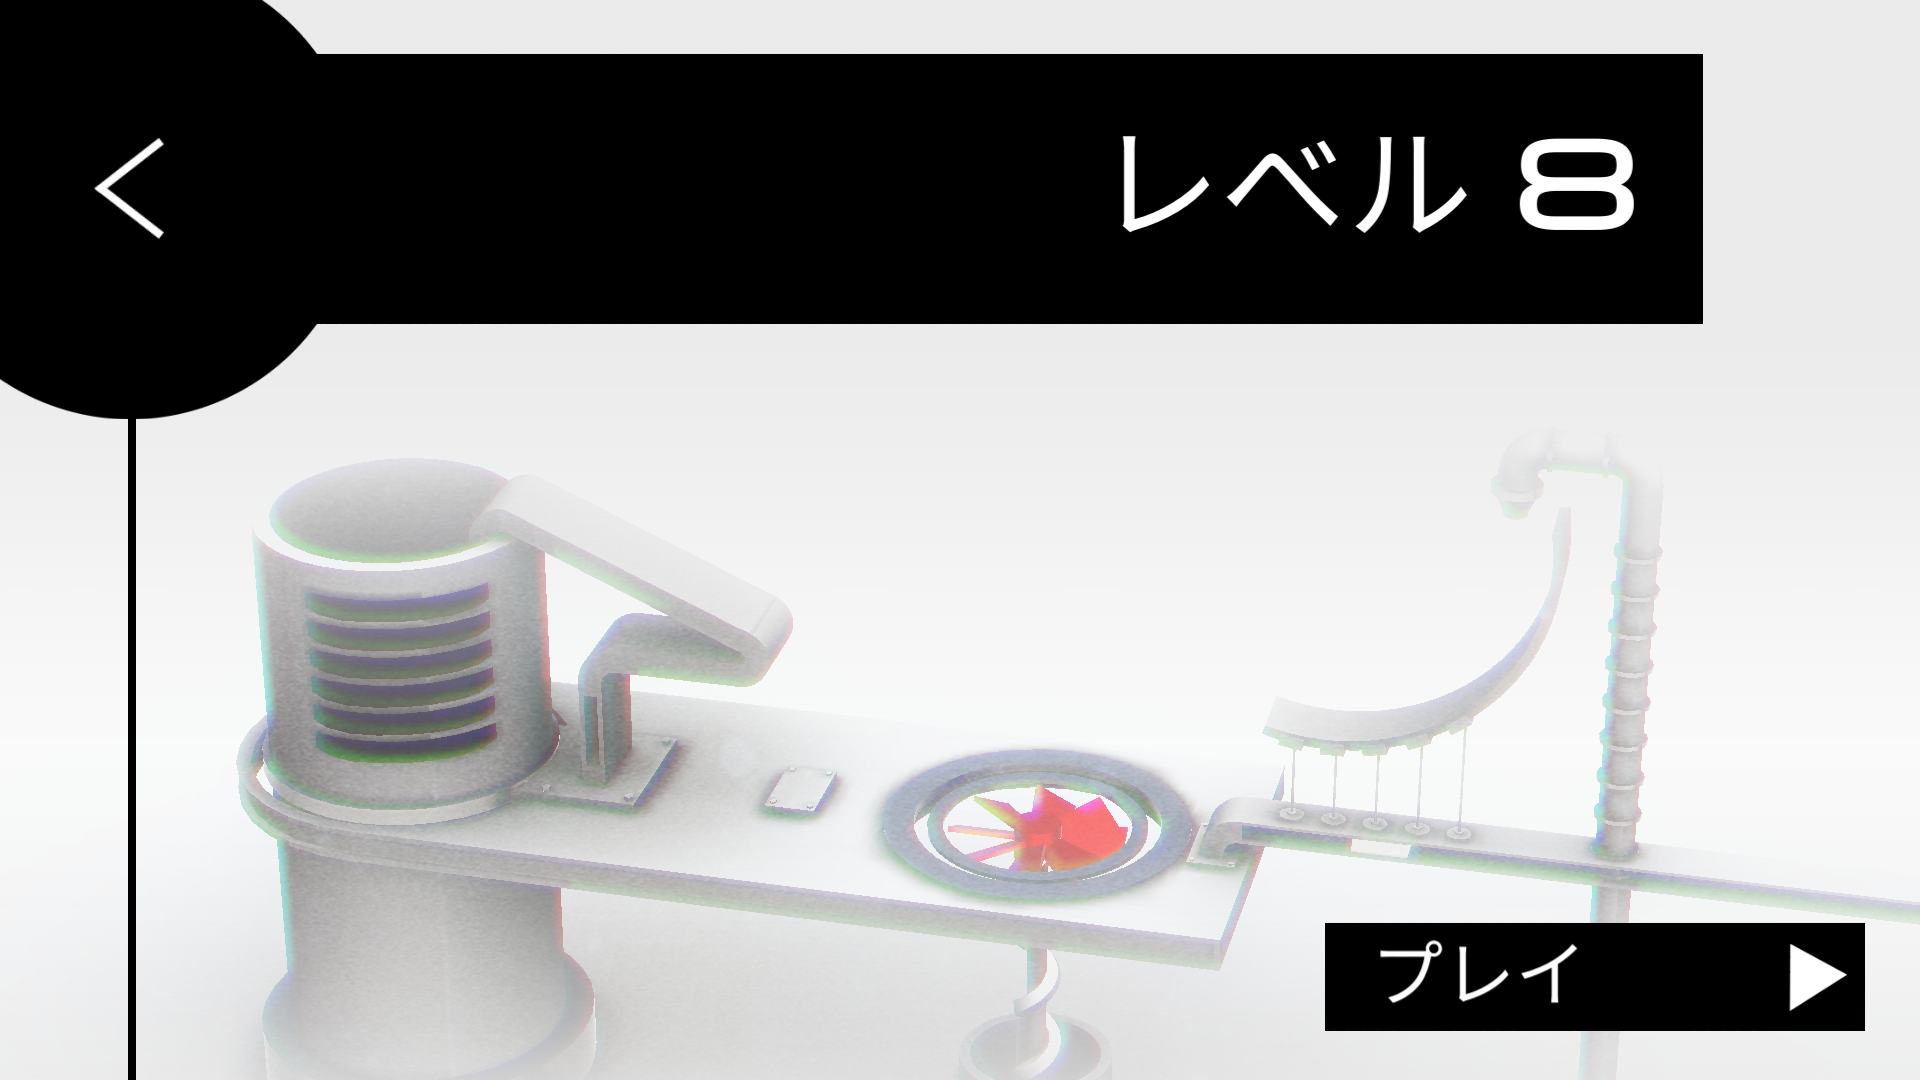 androidアプリ Perchang -パズルボール-攻略スクリーンショット1